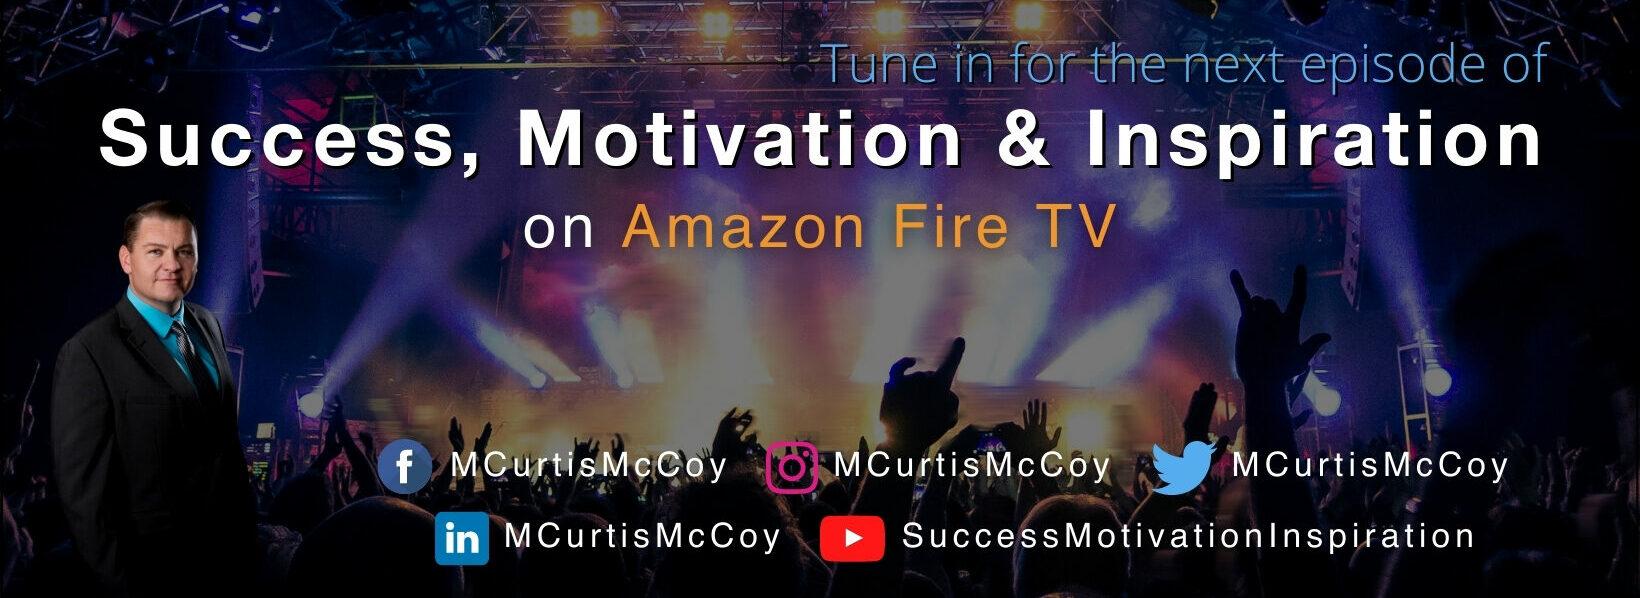 Success, Motivation & Inspiration on Amazon Fire TV